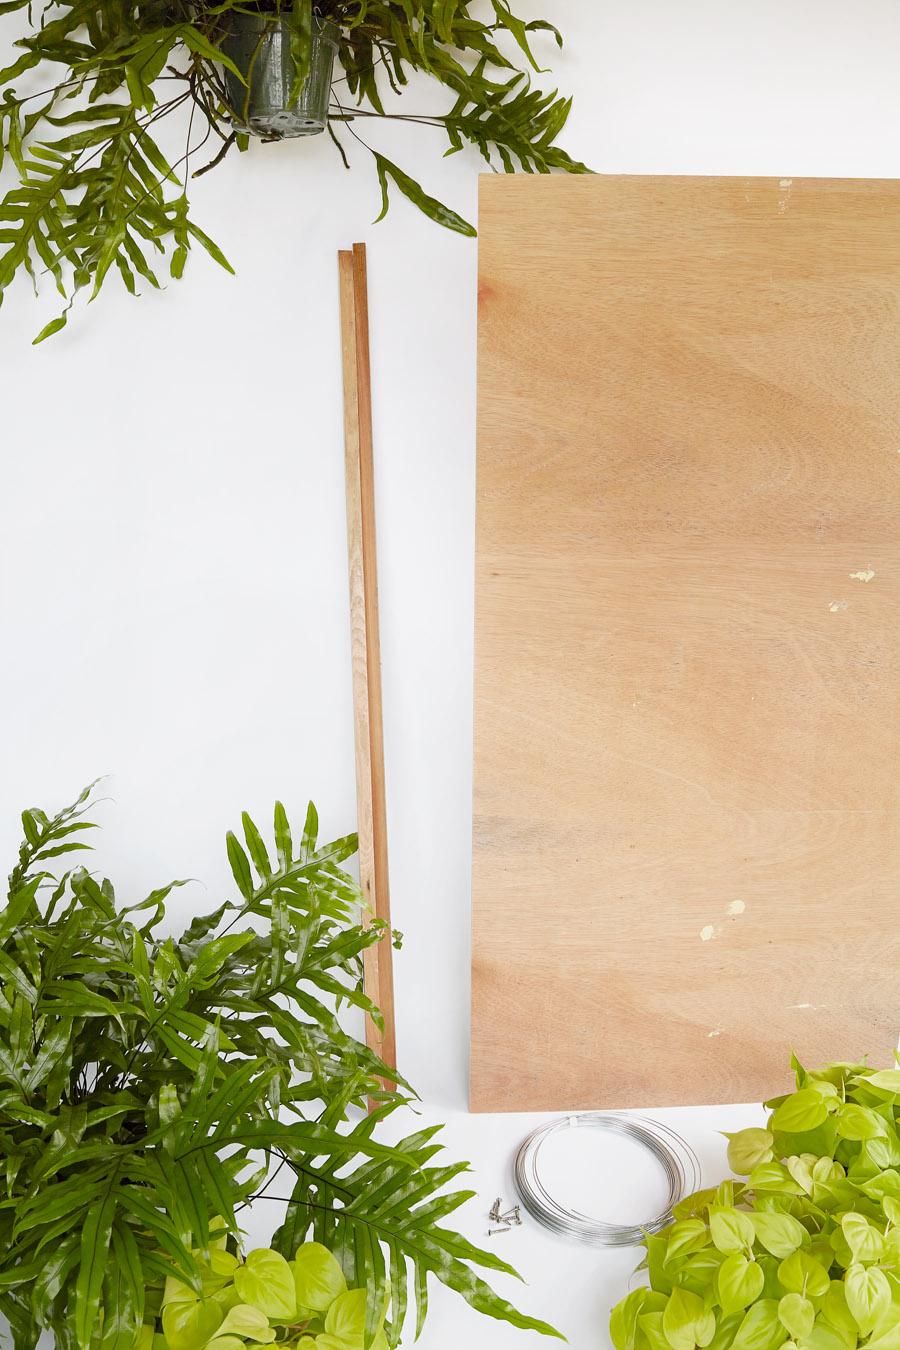 2-faca-voce-mesmo-jardim-vertical-para-decorar-a-casa